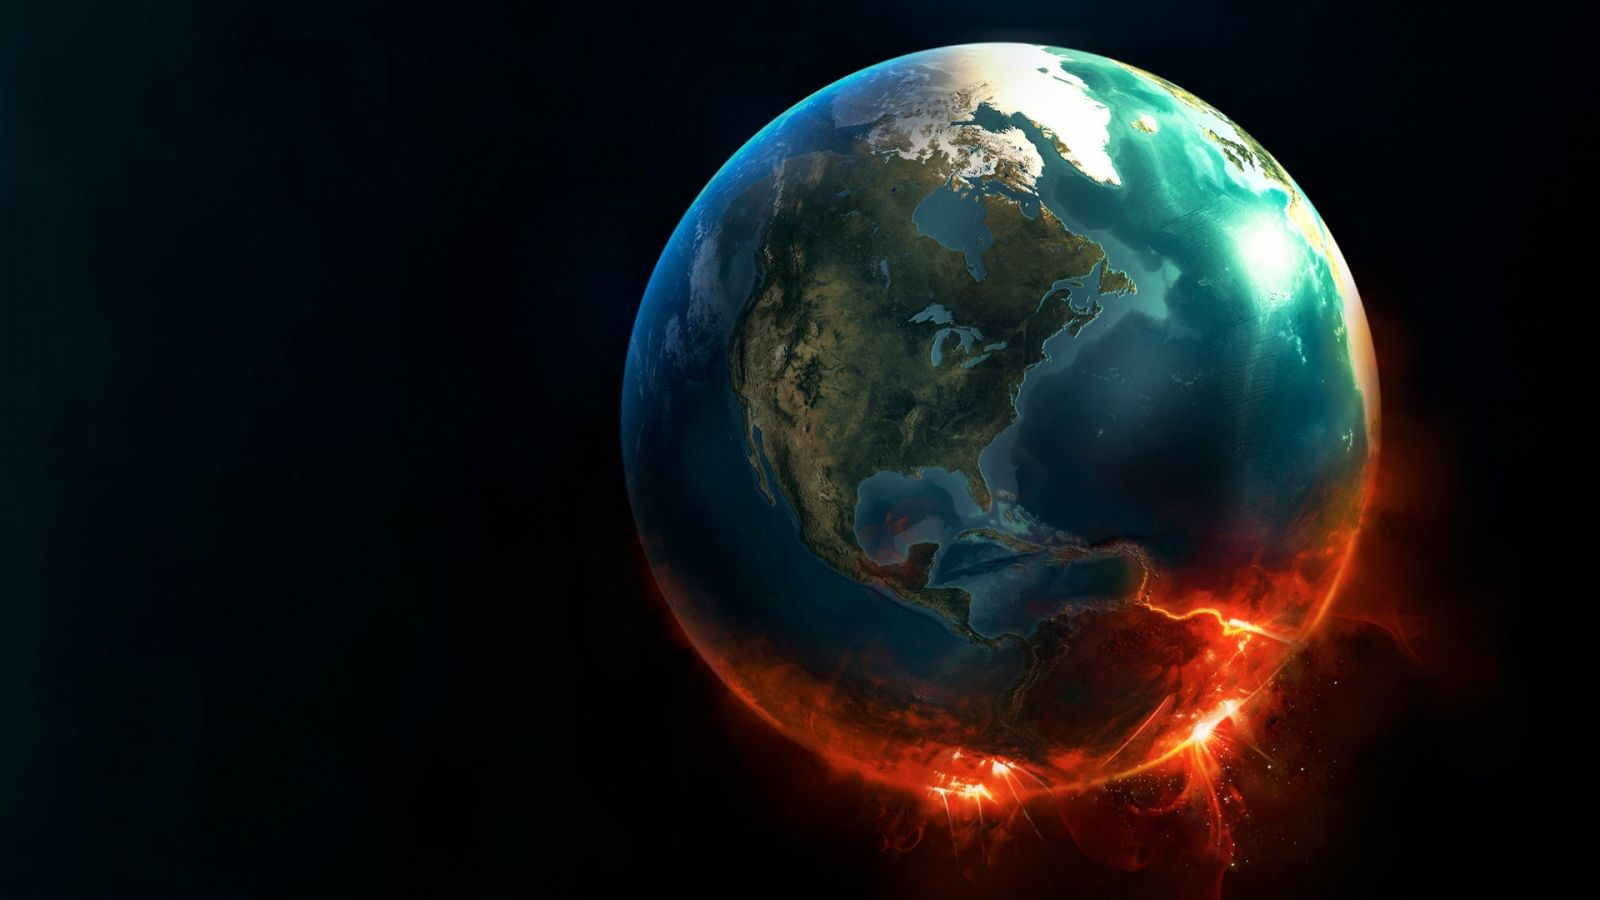 http://4.bp.blogspot.com/-GXxcvnyxiUs/UM6U7JpYzmI/AAAAAAAADa8/9dt-QGX6s0U/s1600/Planeta+Tierra.jpg